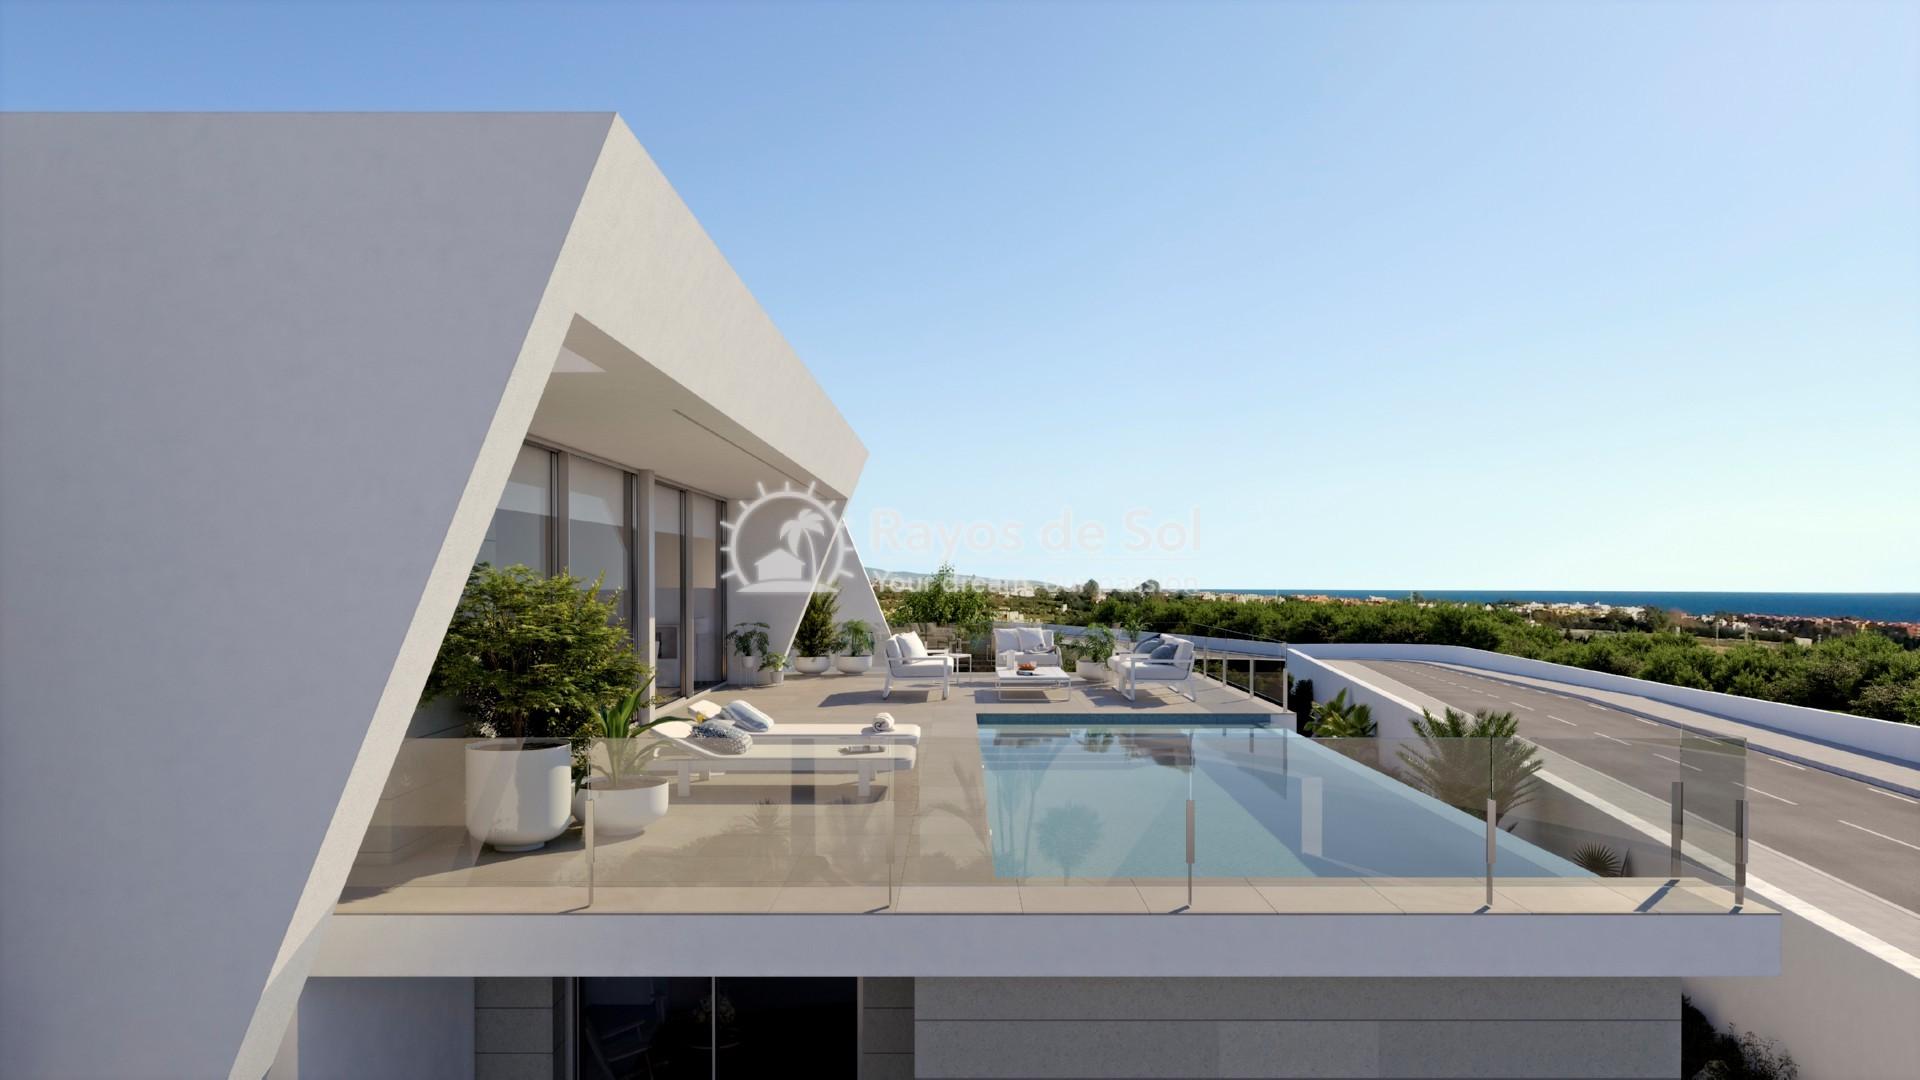 Villa with stunning views in Cumbre del Sol, Benitachell, Costa Blanca (BEVALIDIT) - 3